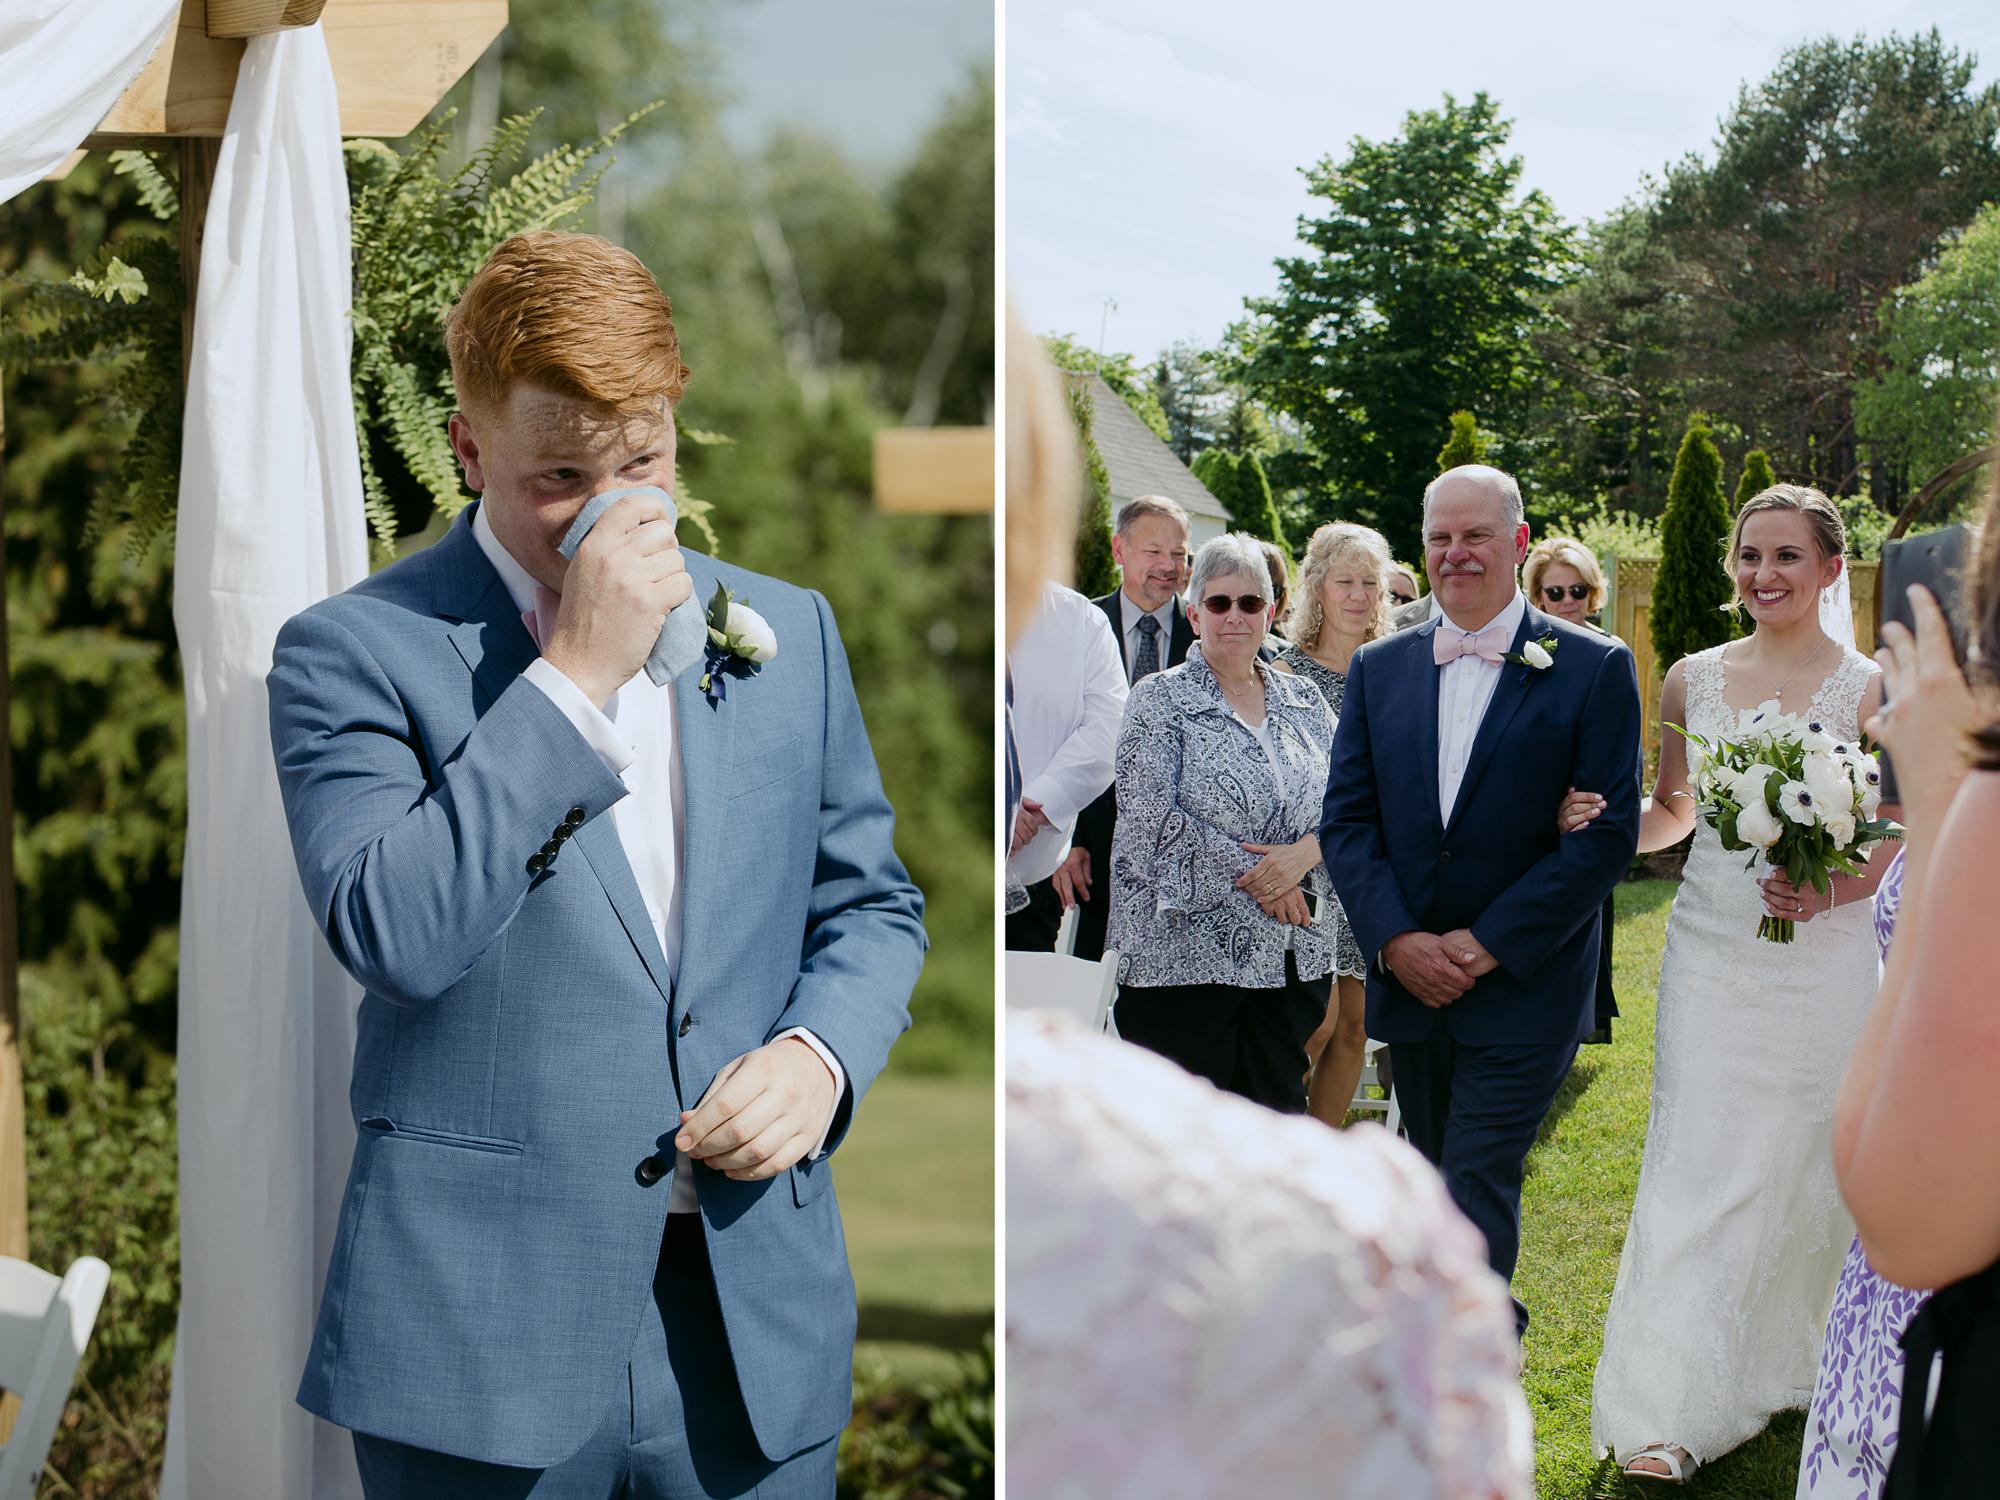 Livewell_Farm_wedding_Harpswell_maine_Meghan_Jim_011.jpg